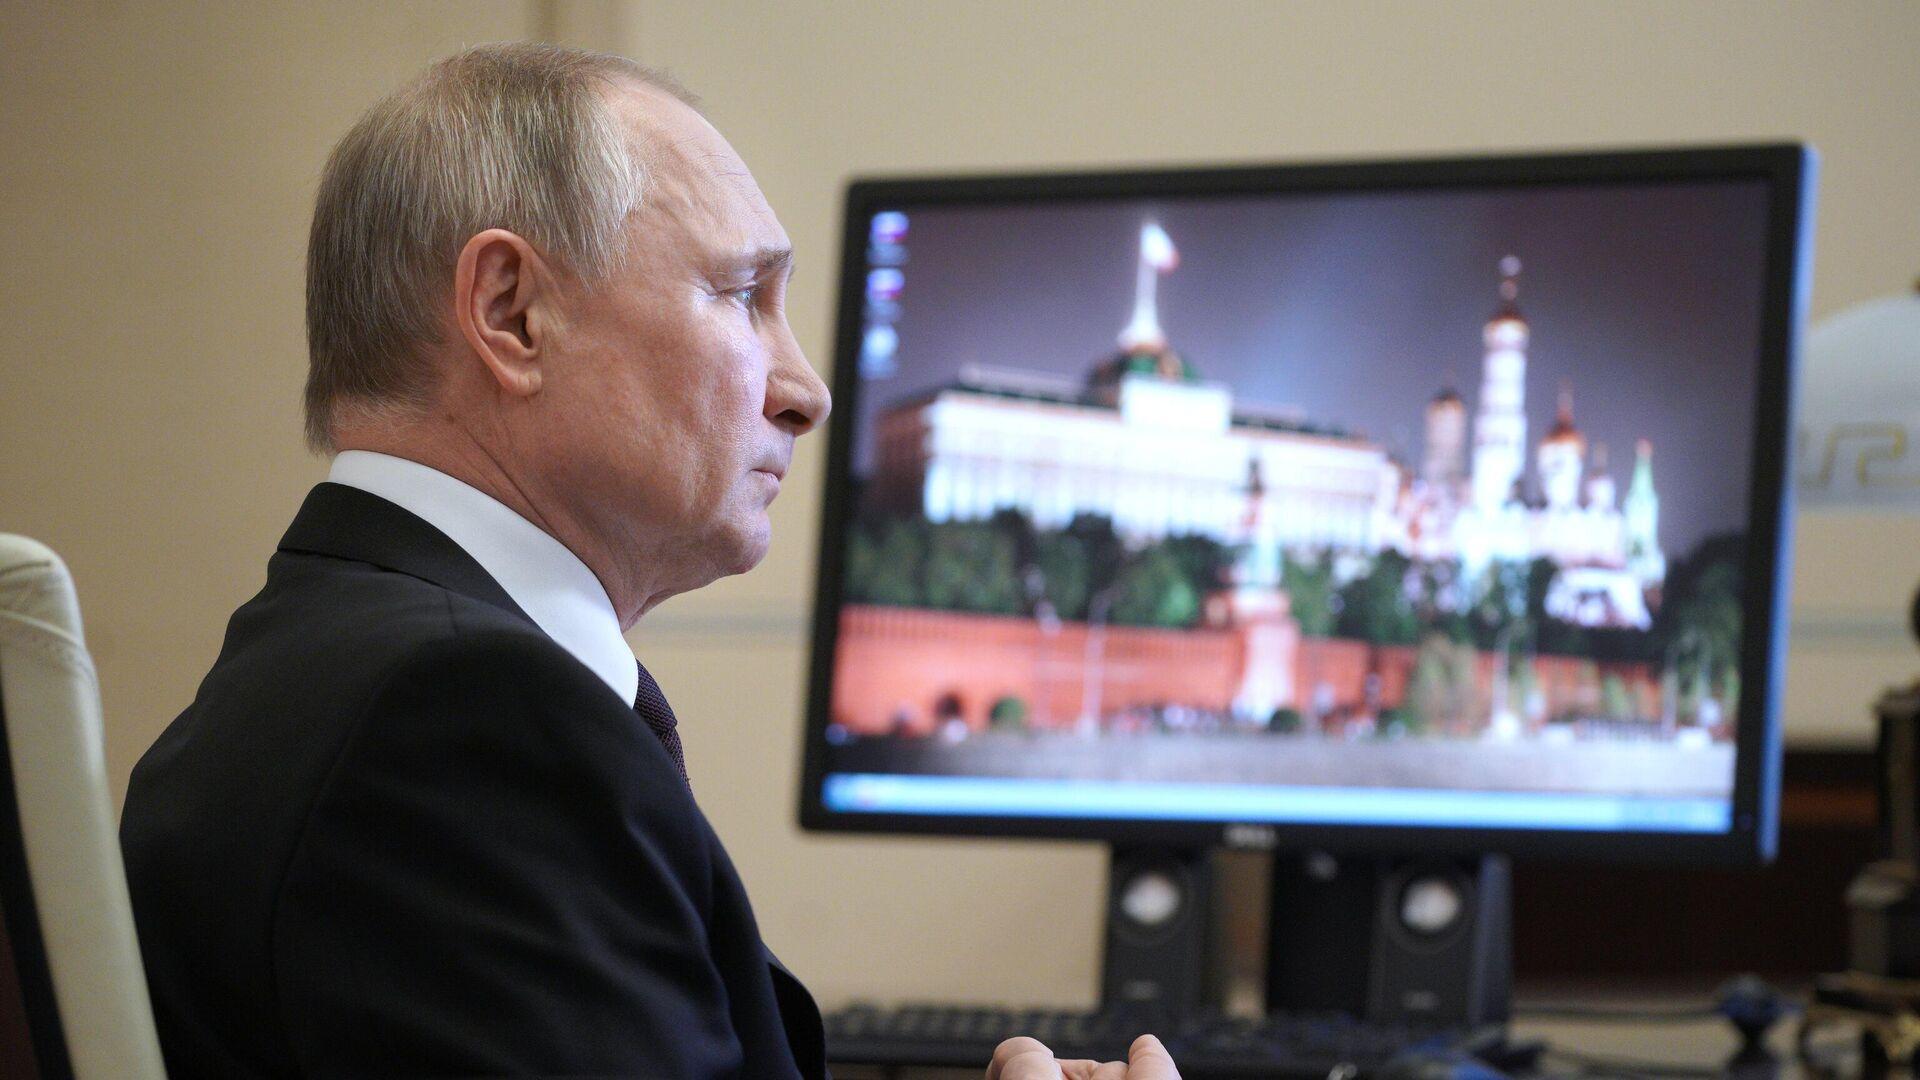 Vladímir Putin, presidente de Rusia - Sputnik Mundo, 1920, 18.03.2021